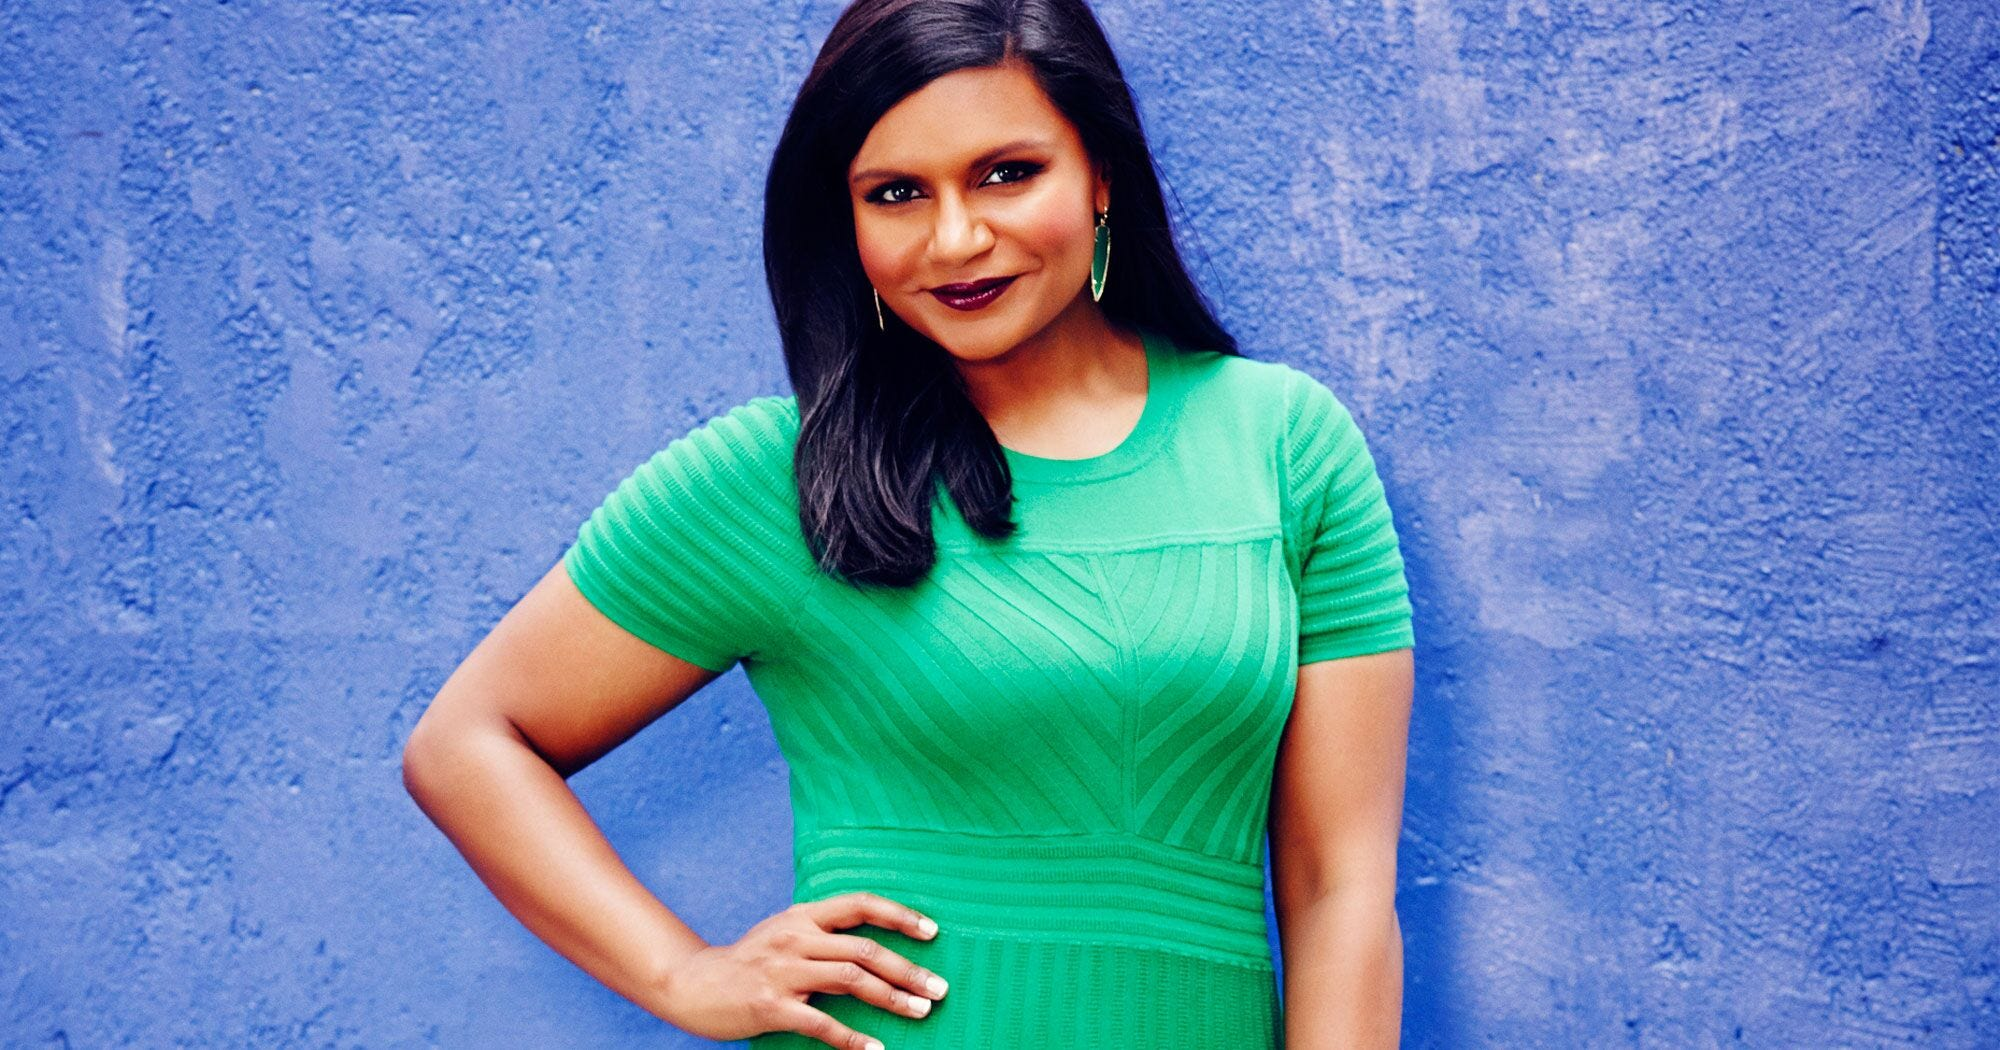 d180a997dd08d Inbetweeners - Medium Sized Women Body Positivity